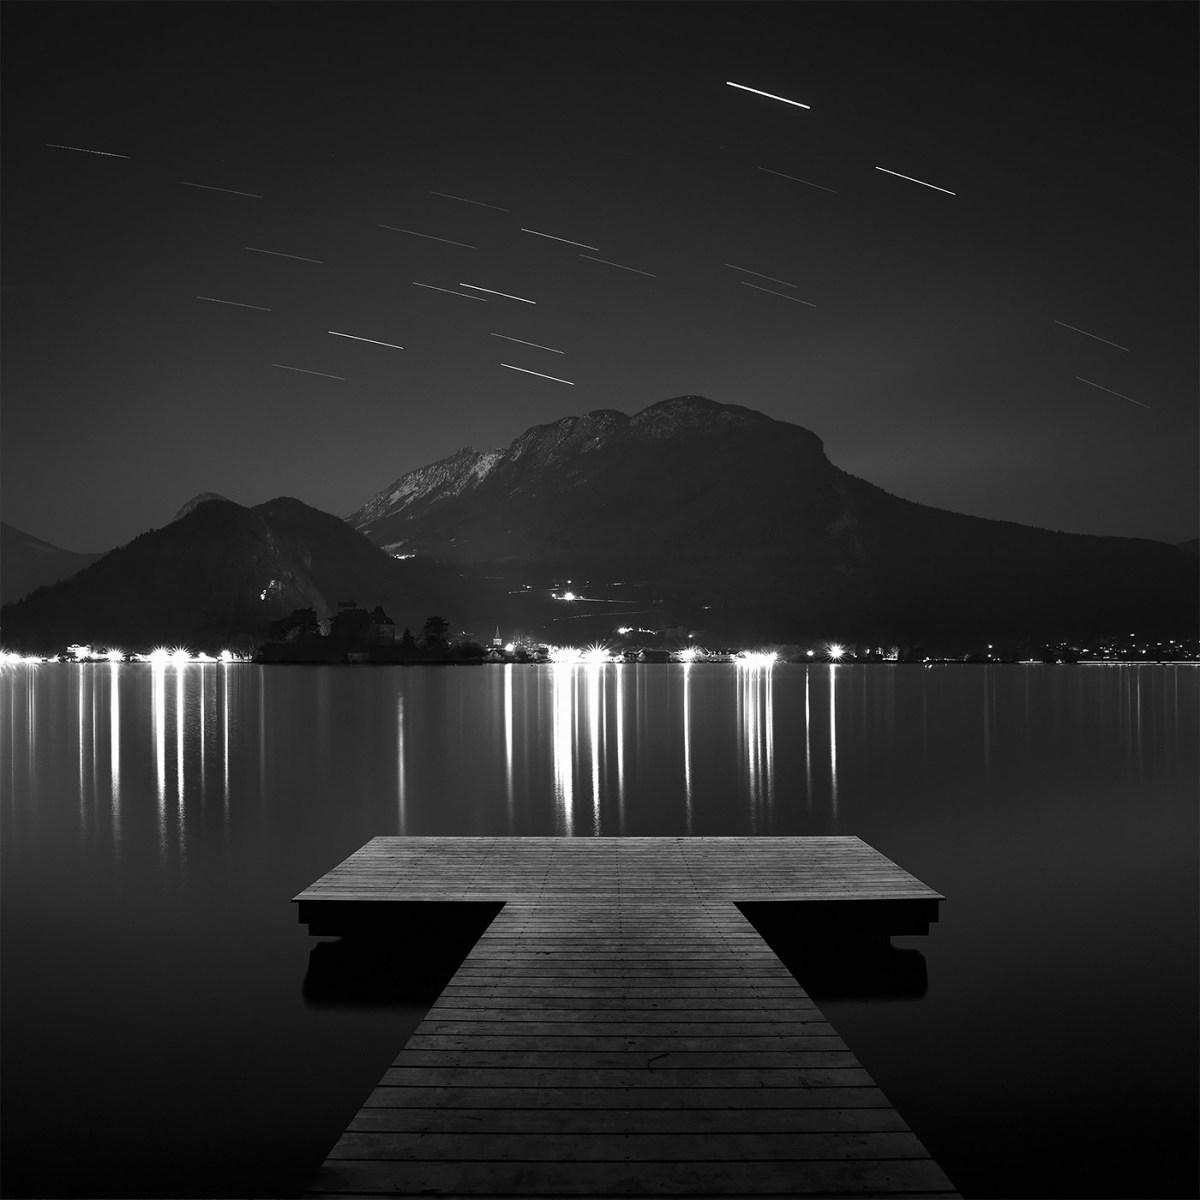 photography-arnaud-bathiard-13